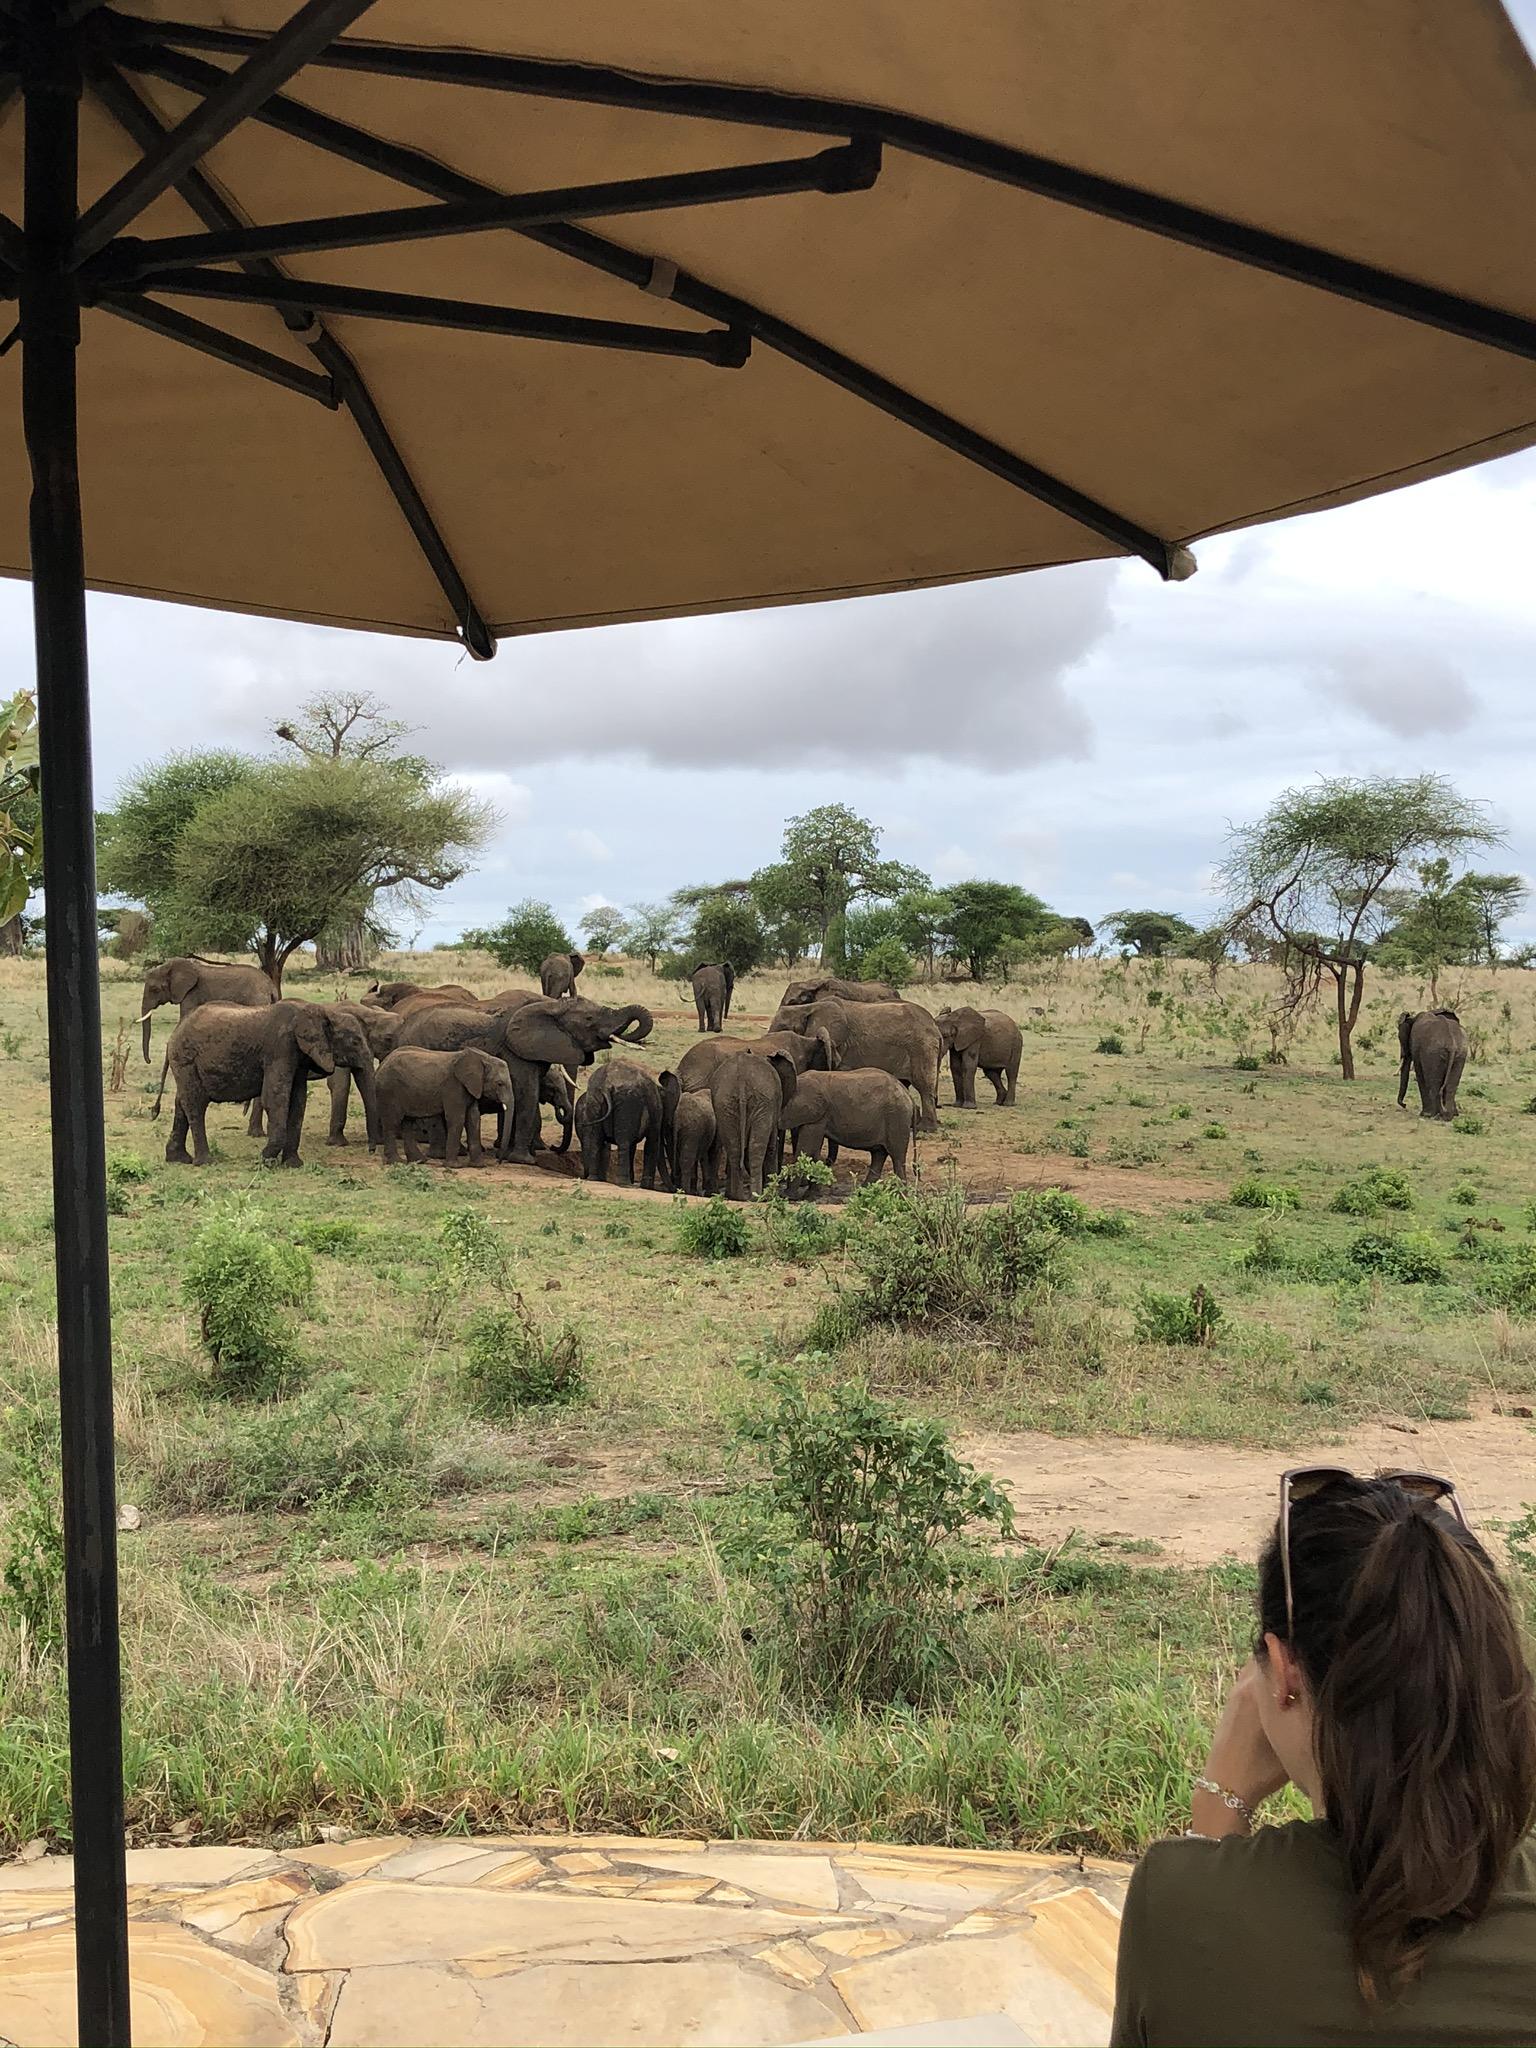 Nimali Africa fam trip 2019 with Helen & Sally